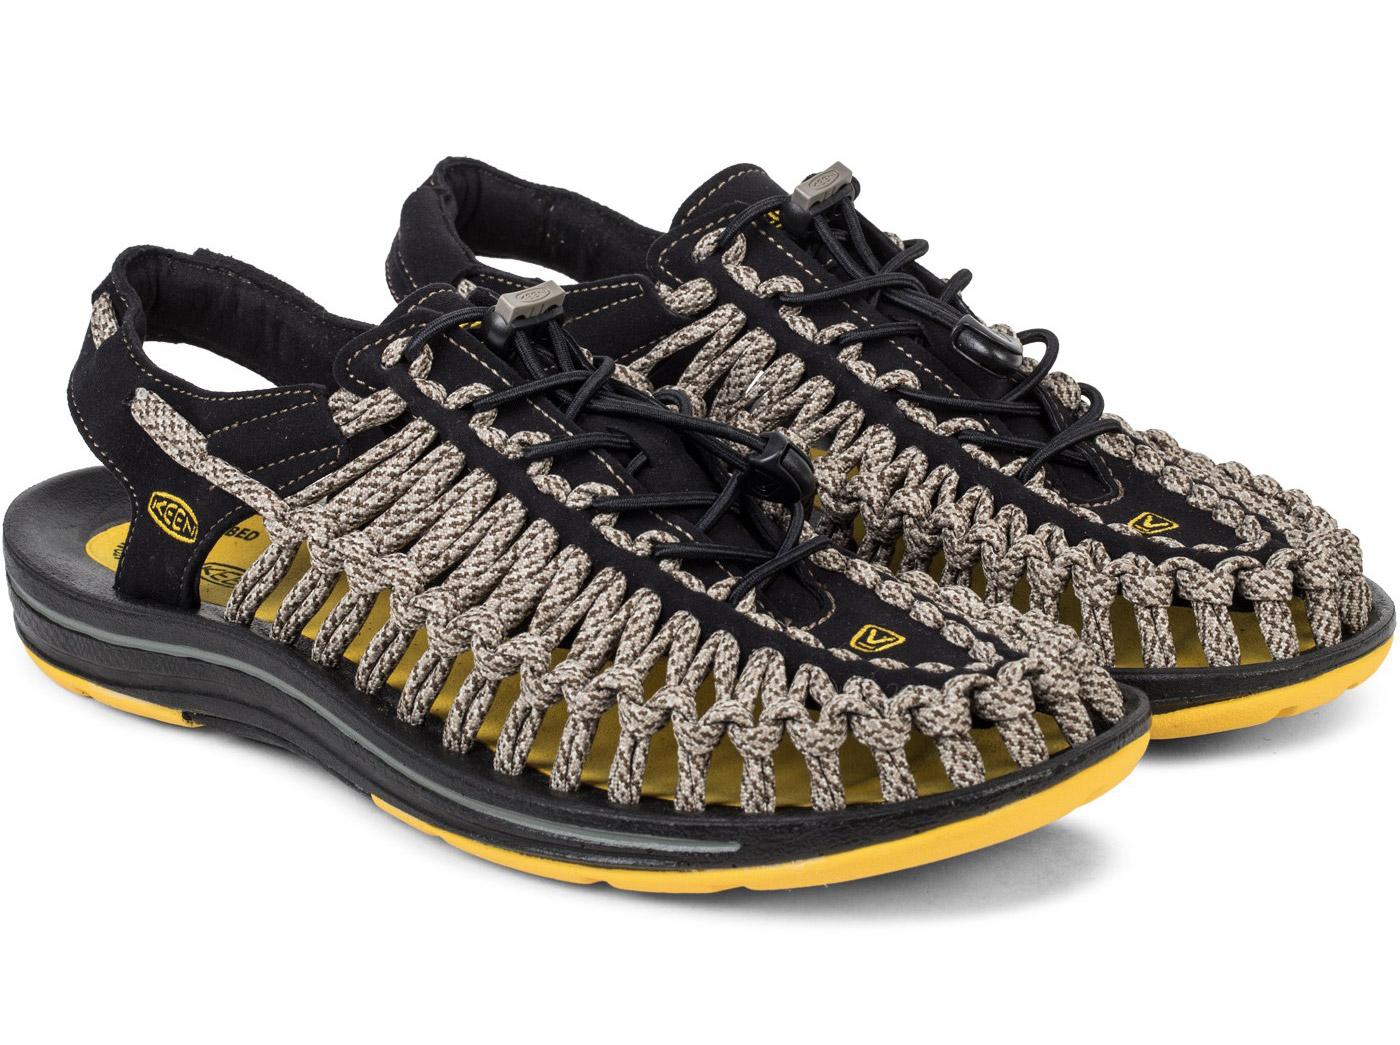 Keen Lancia Unkeen Shoes